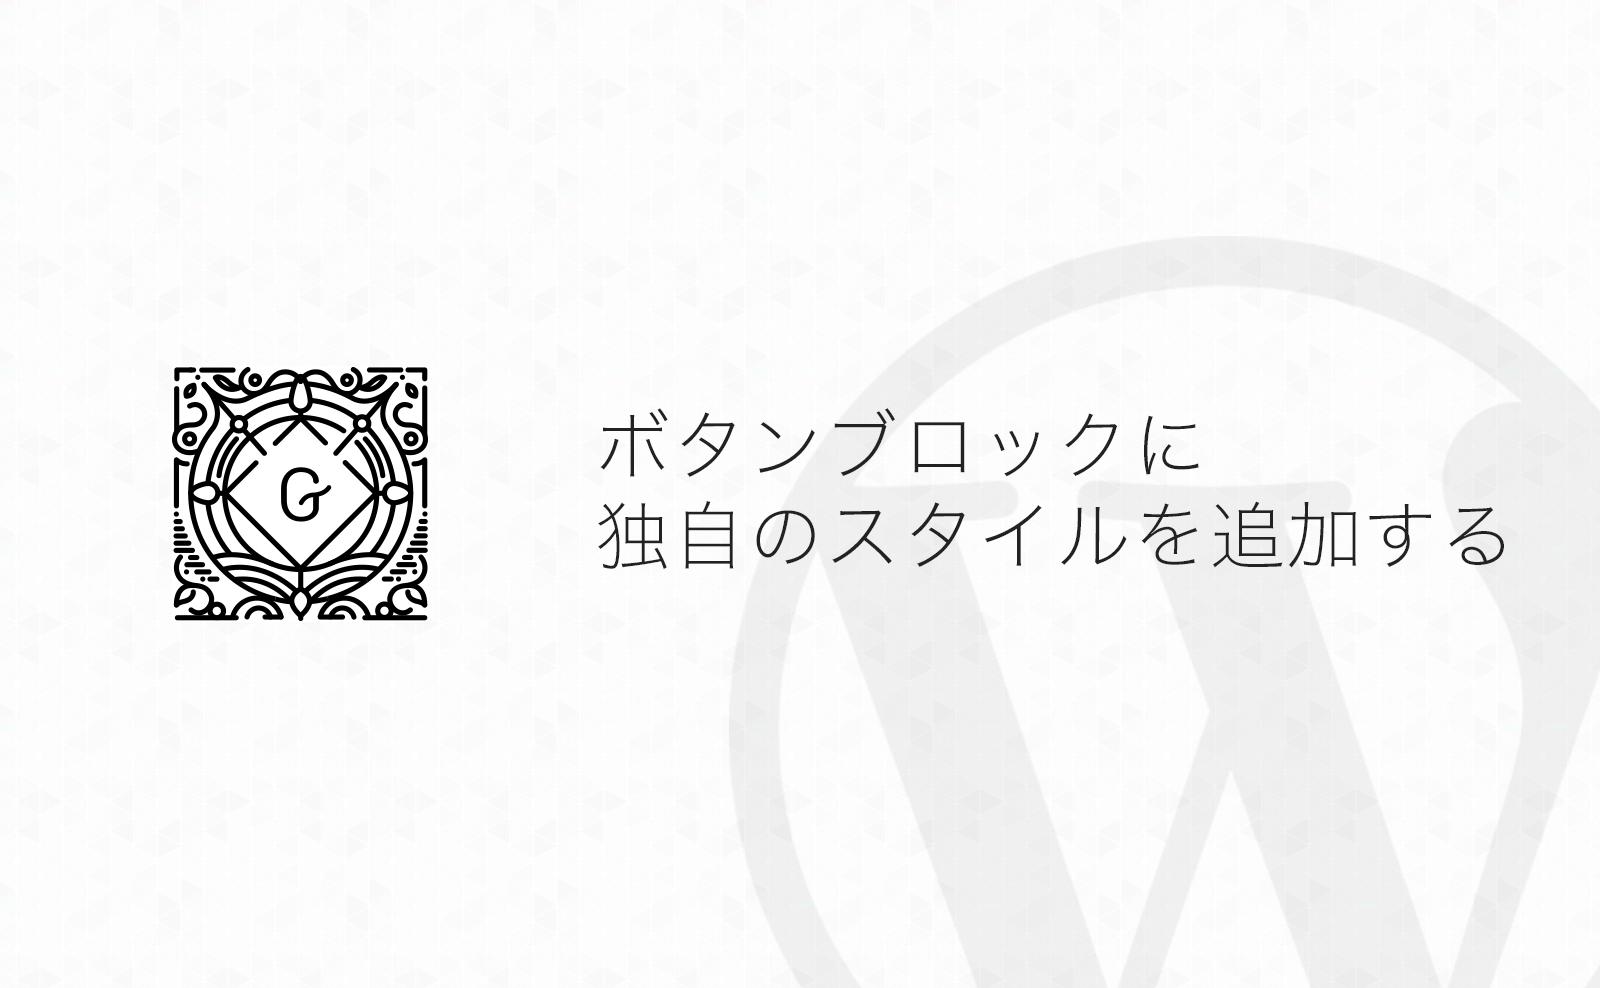 【WordPress】Gutenbergのボタンブロックに独自のスタイルを追加してみる